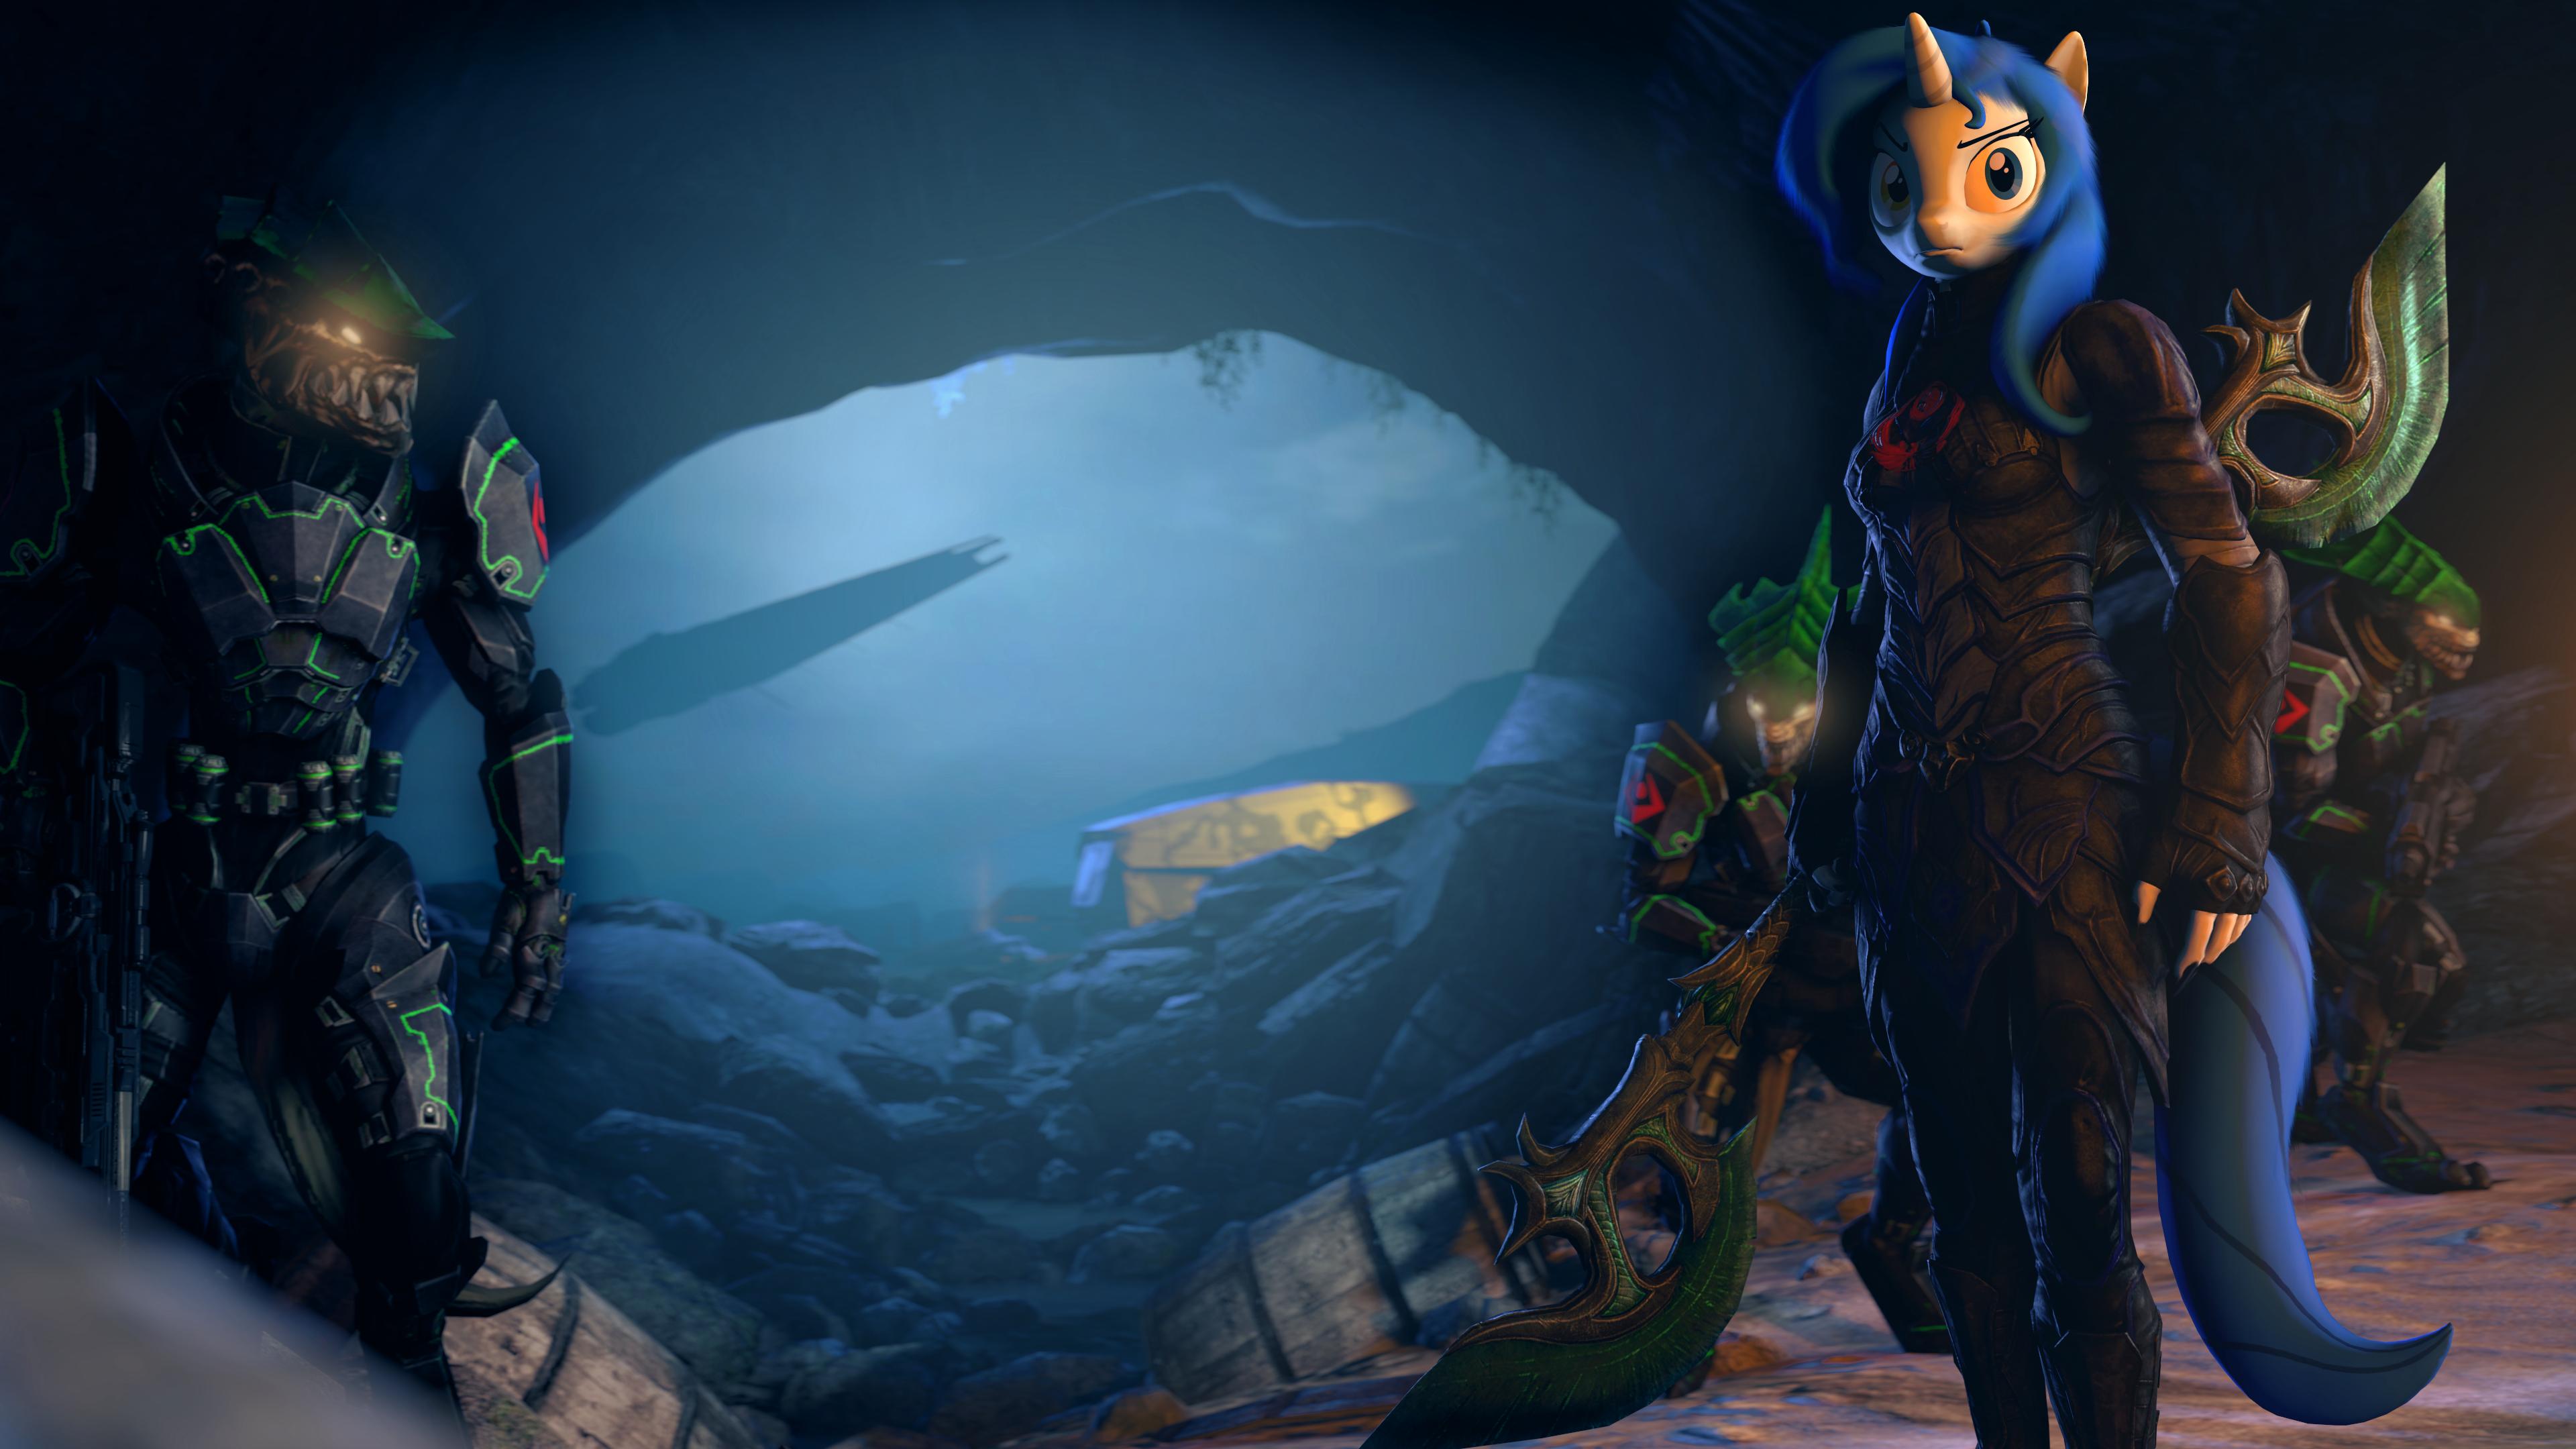 Cave dwelling by zOMG-a-DropBear